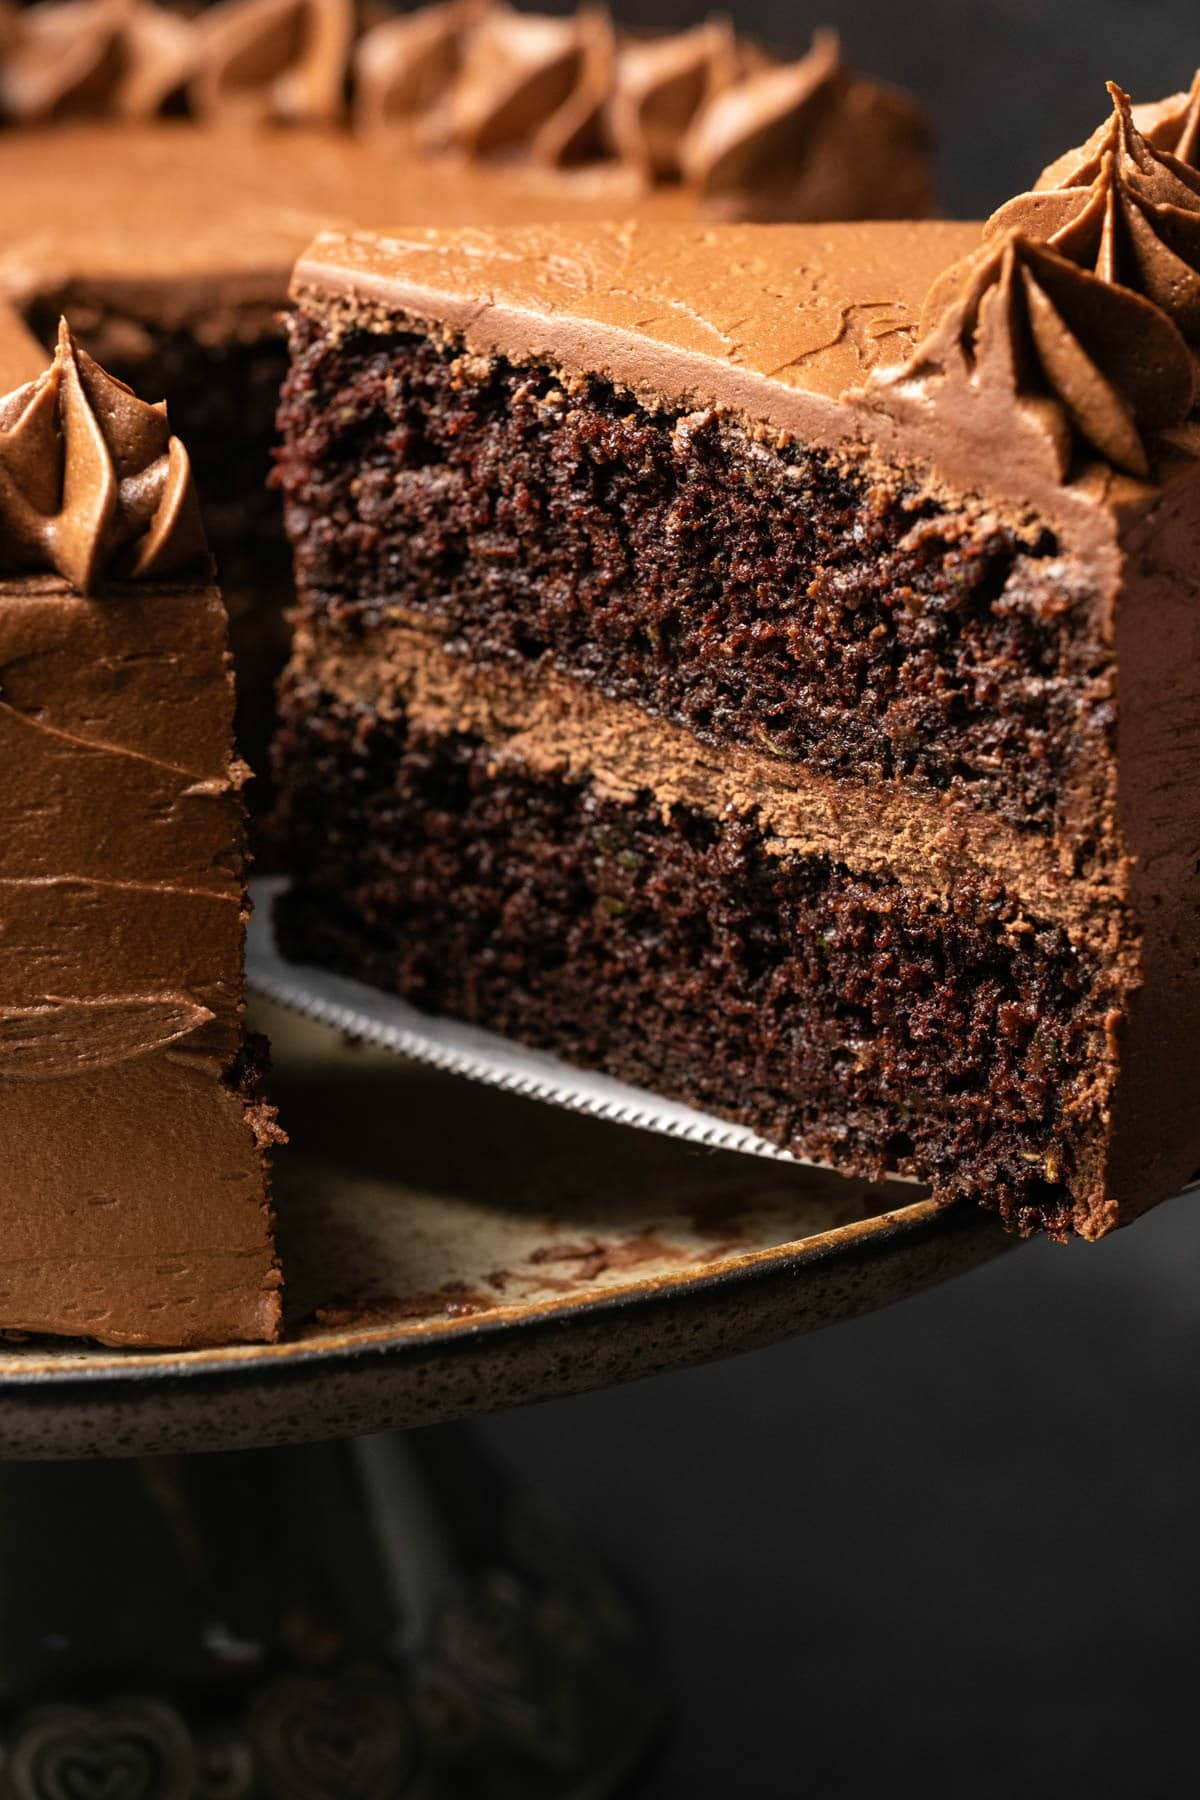 Slice of zucchini chocolate cake on a cake lifter.